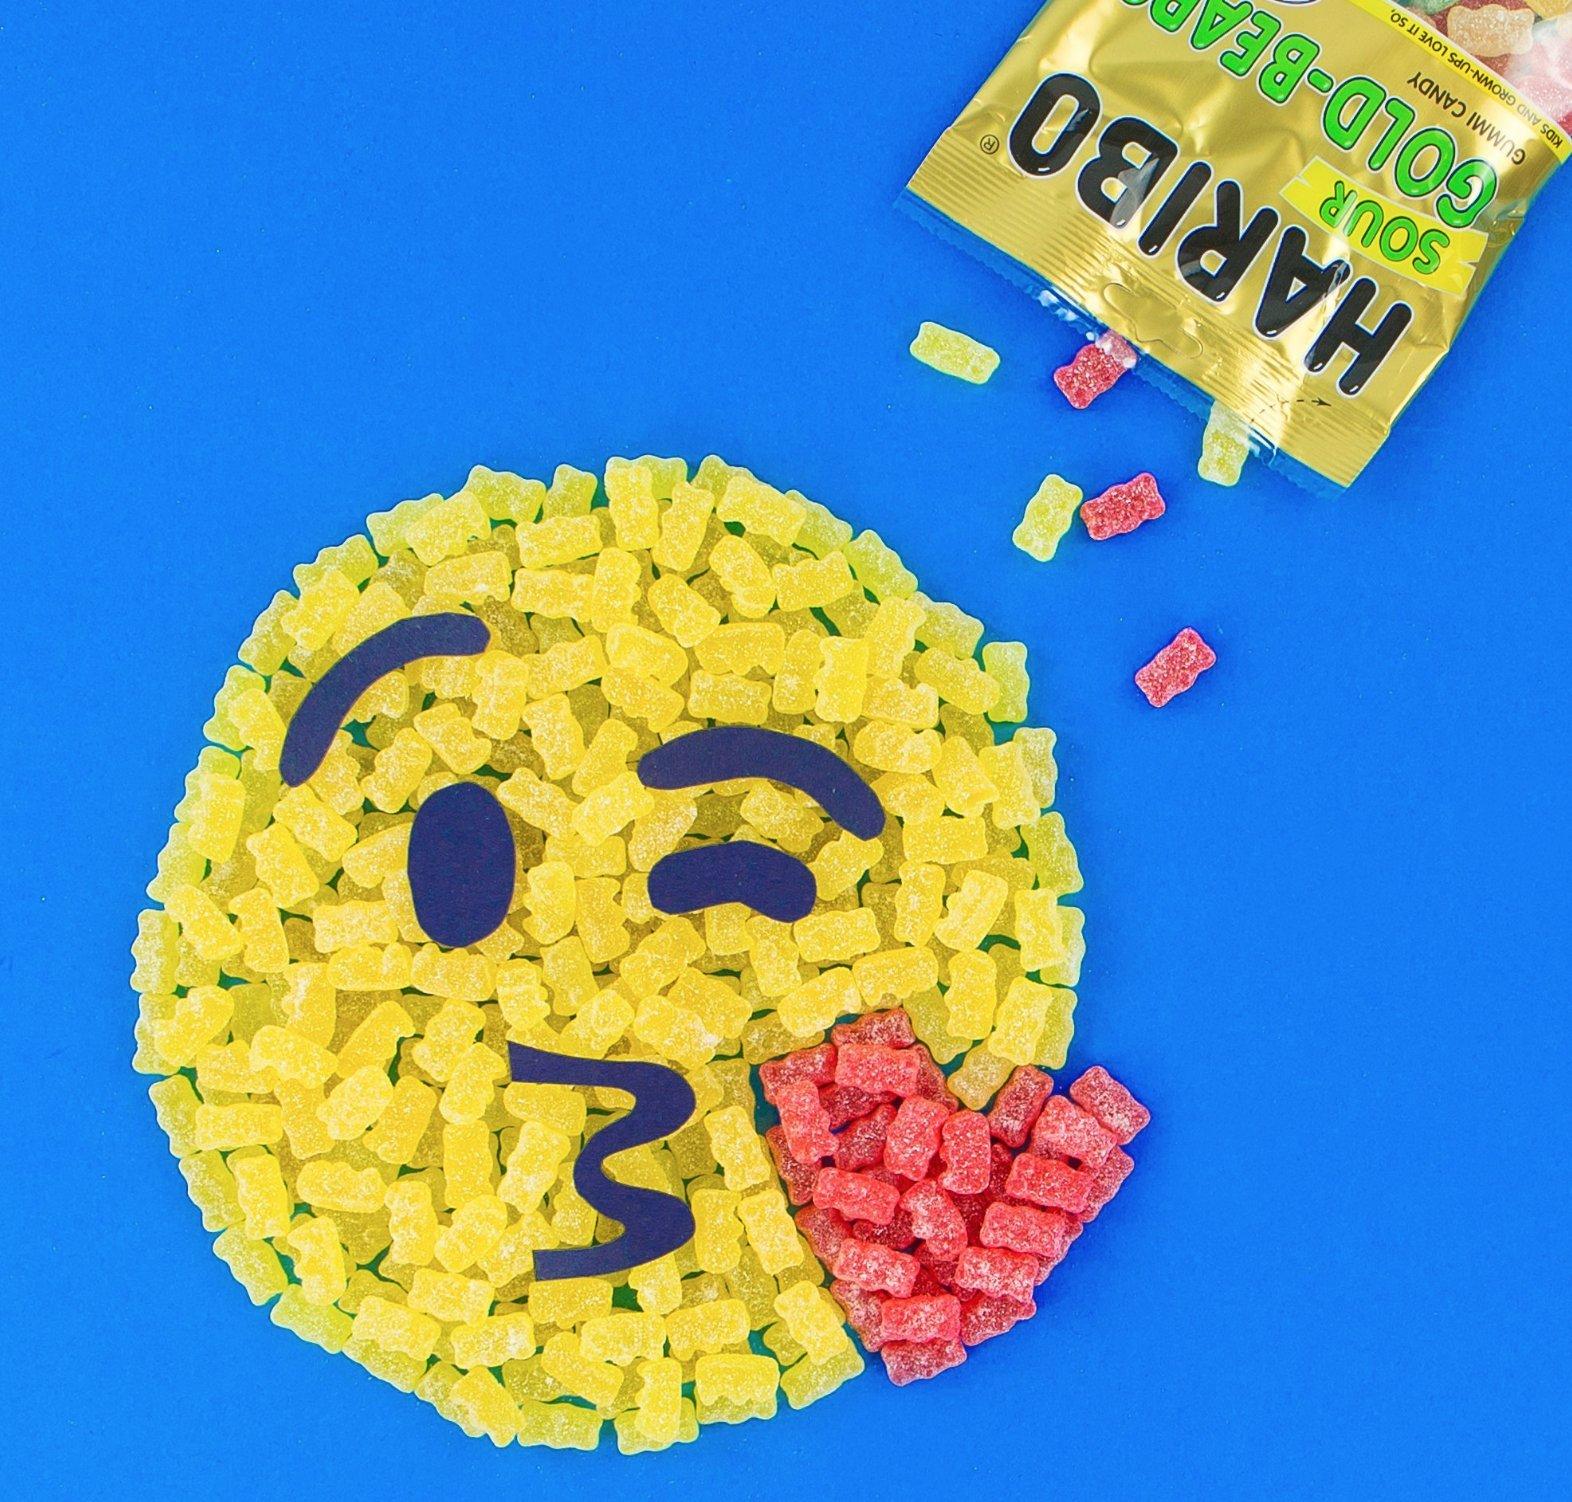 Haribo Gummi Candy, Goldbears Gummi Candy, Sour, 4.5 oz. Bag (Pack of 12) by Haribo (Image #4)